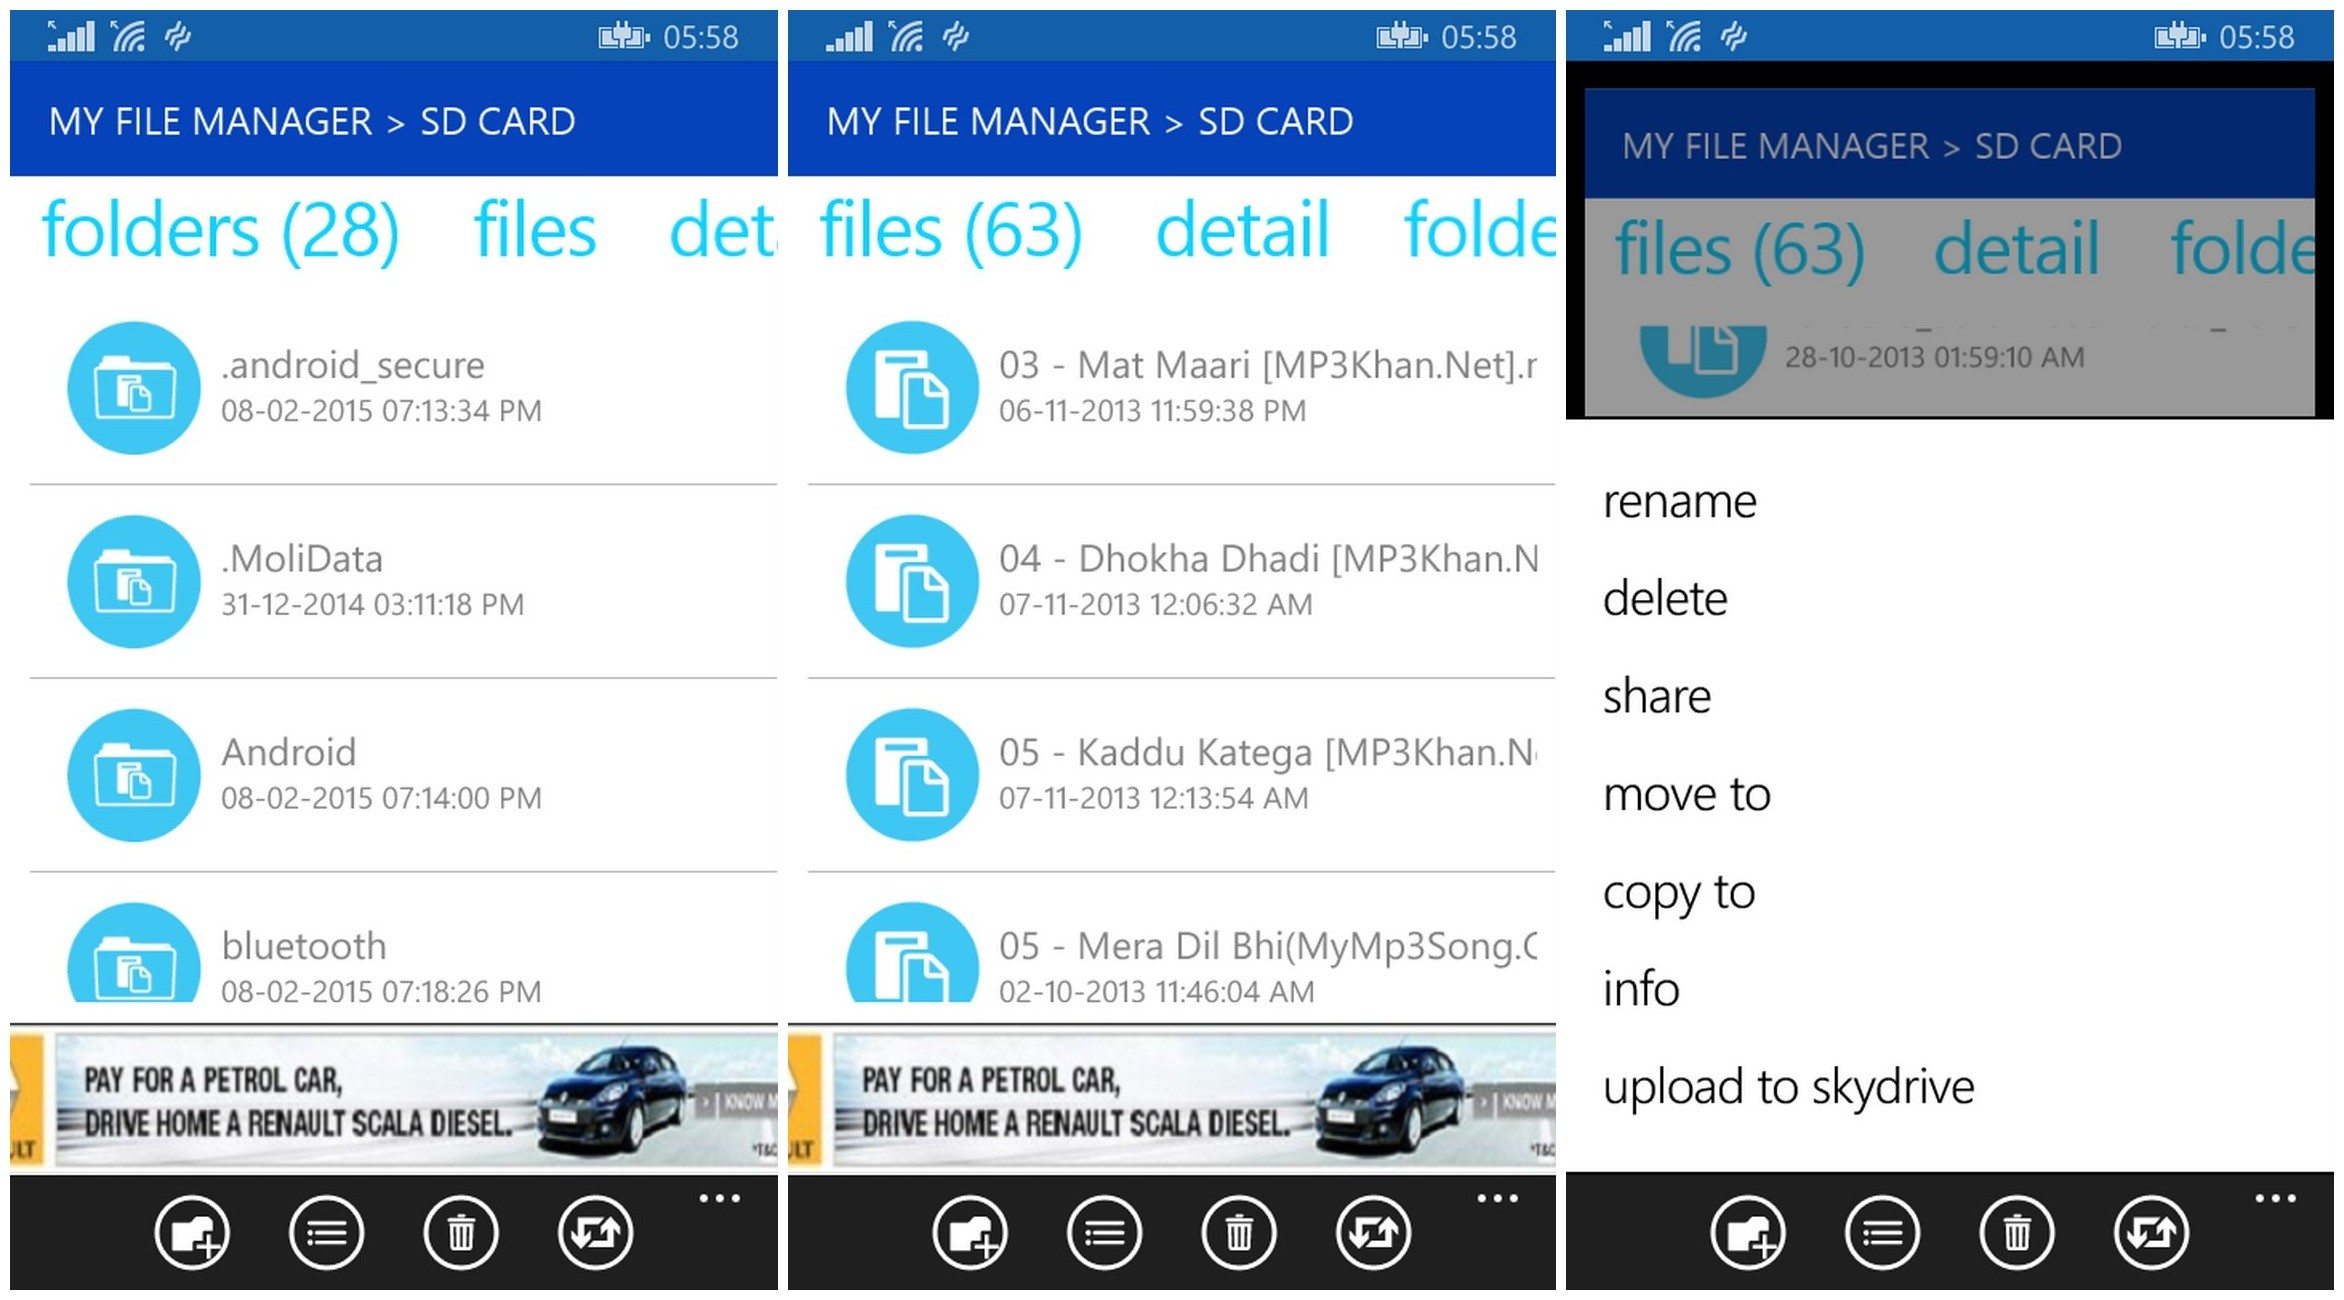 my file manager - Quản lý file trên Windows Phone với My File Manager